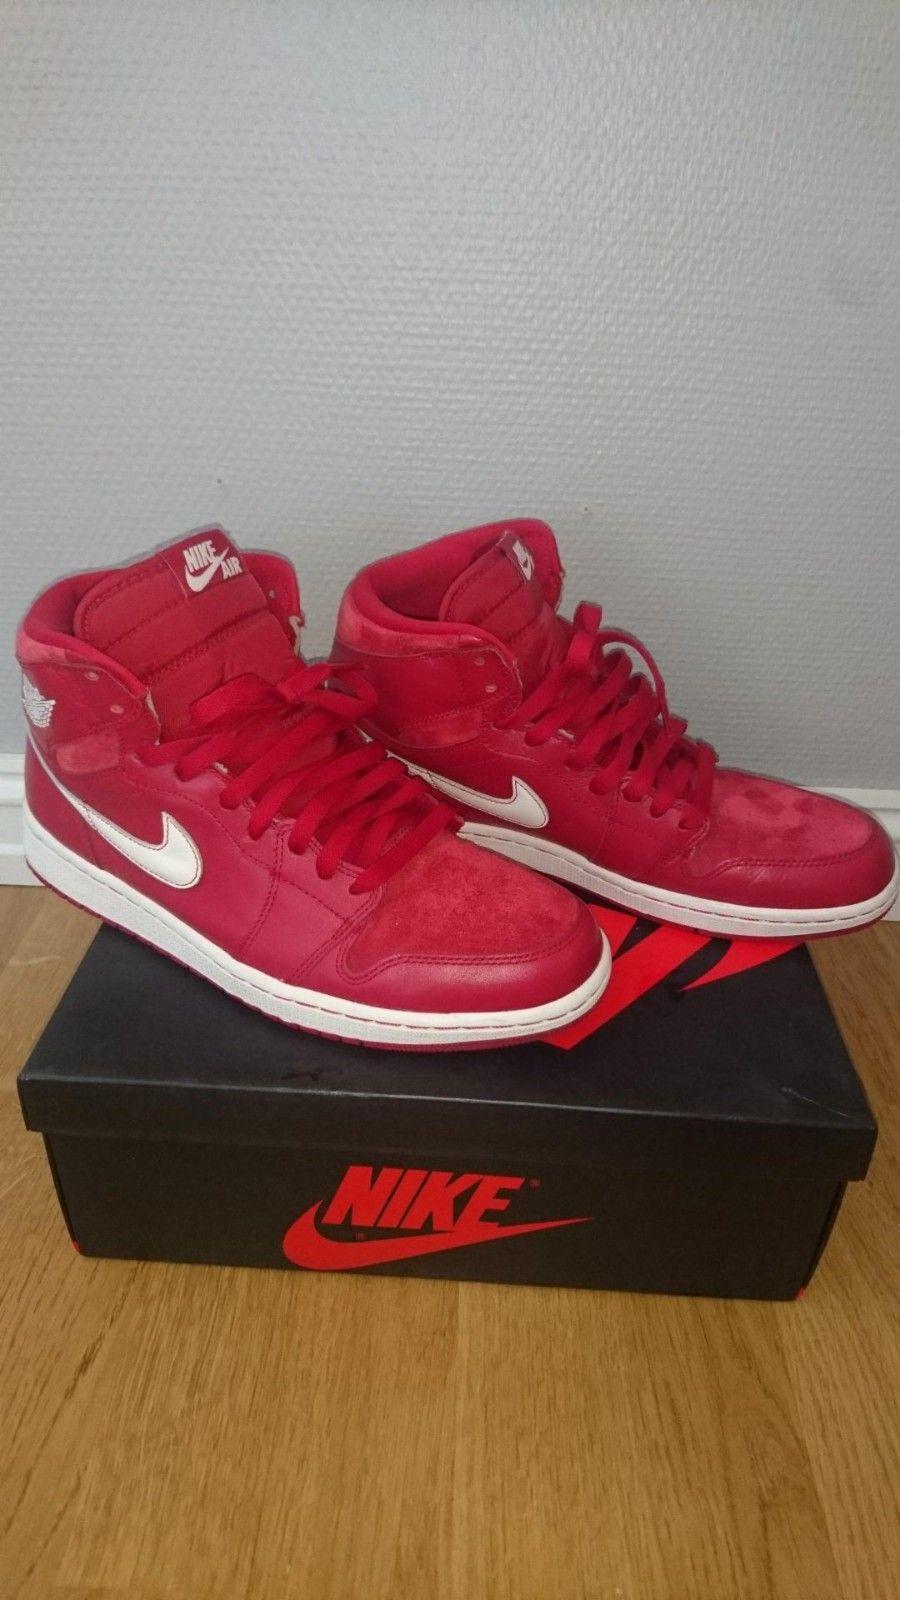 competitive price 6e50c 3734f Nike Air jordan 1 retro euro gym red | FINN.no